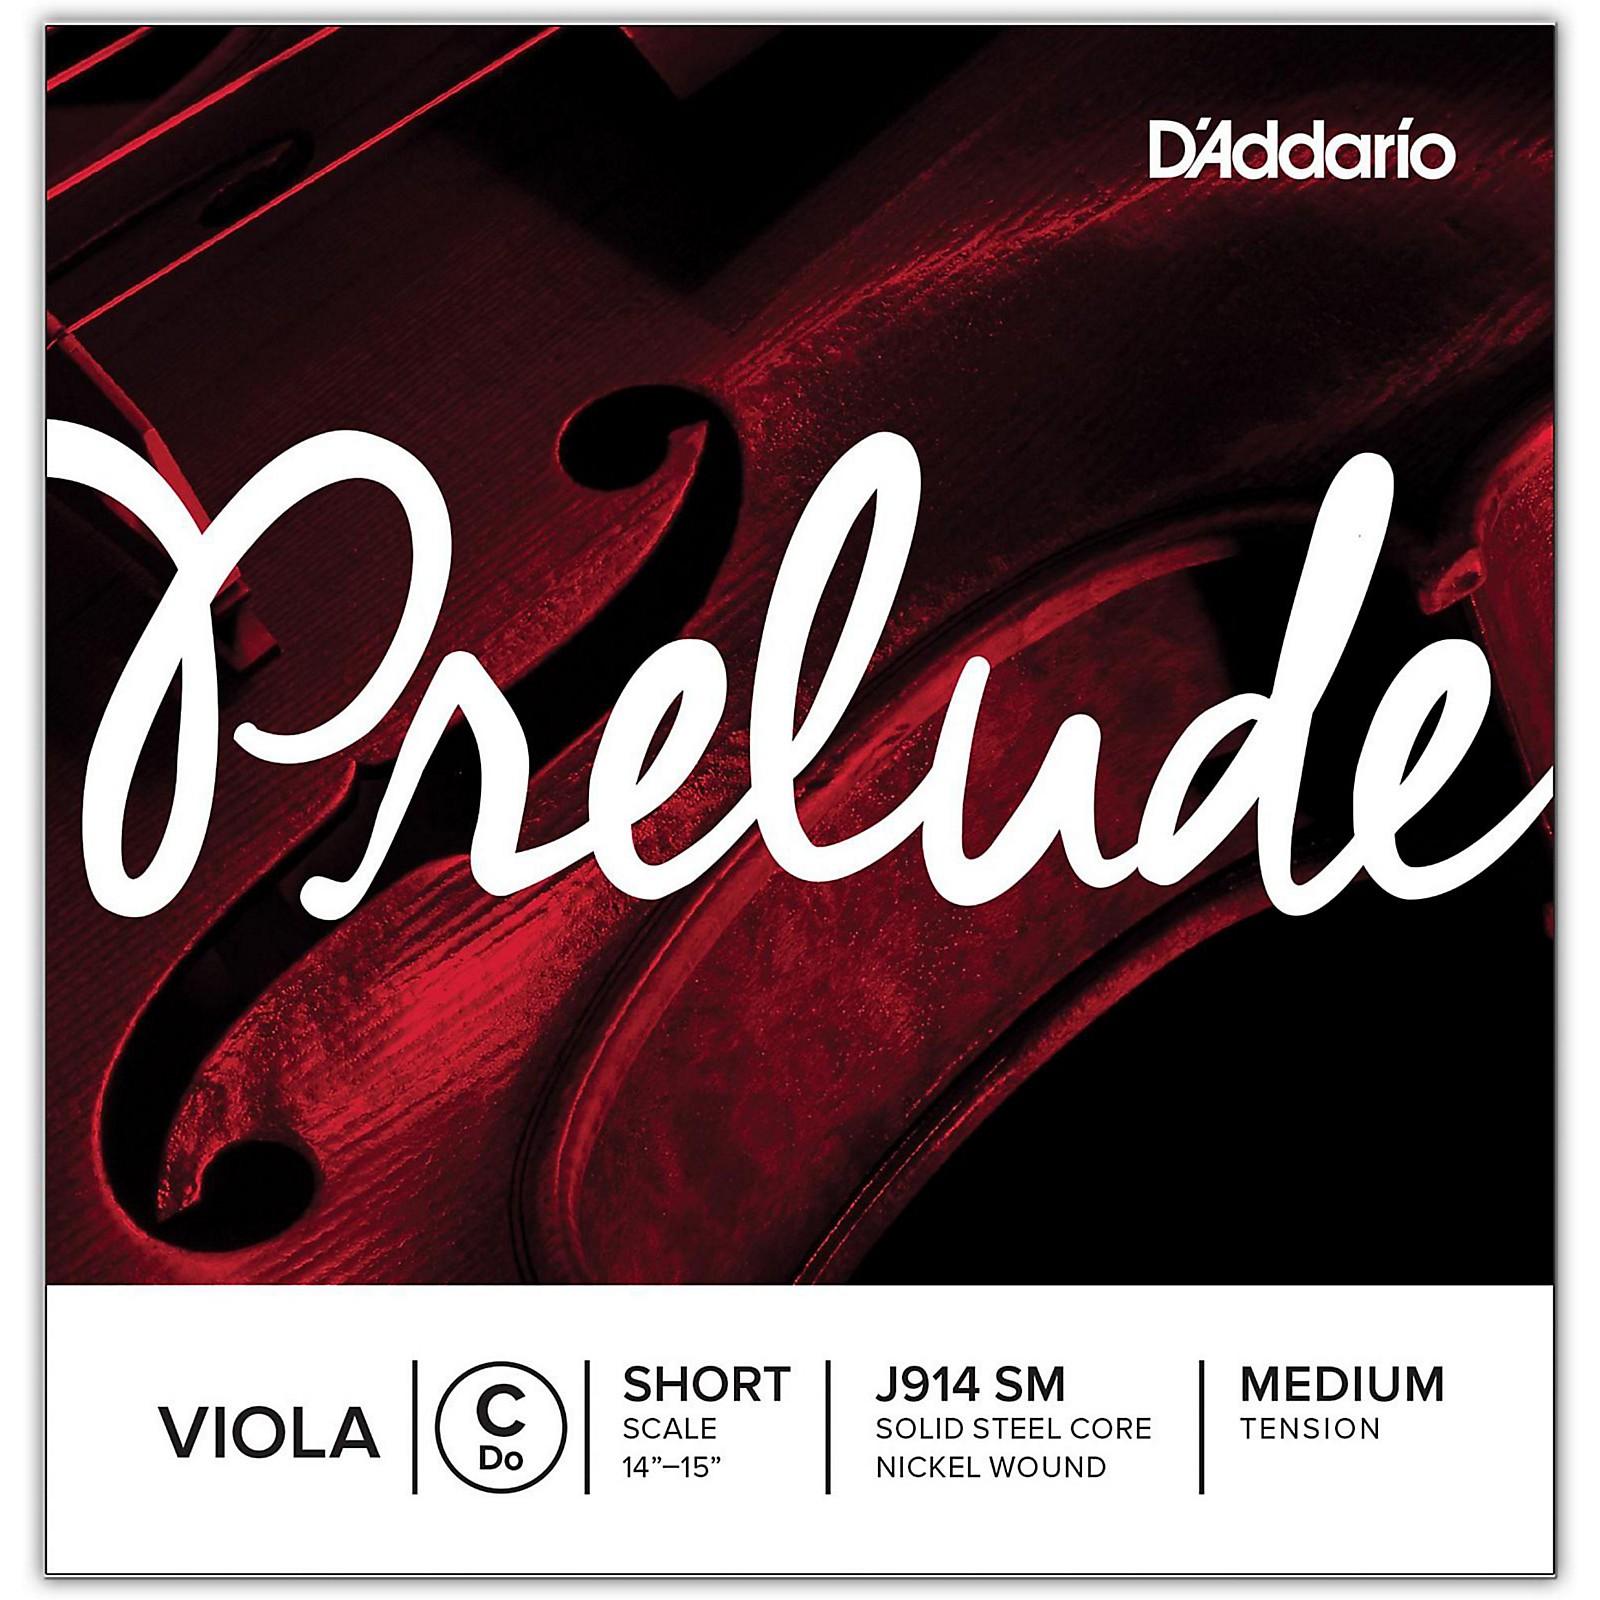 D'Addario Prelude Series Viola C String